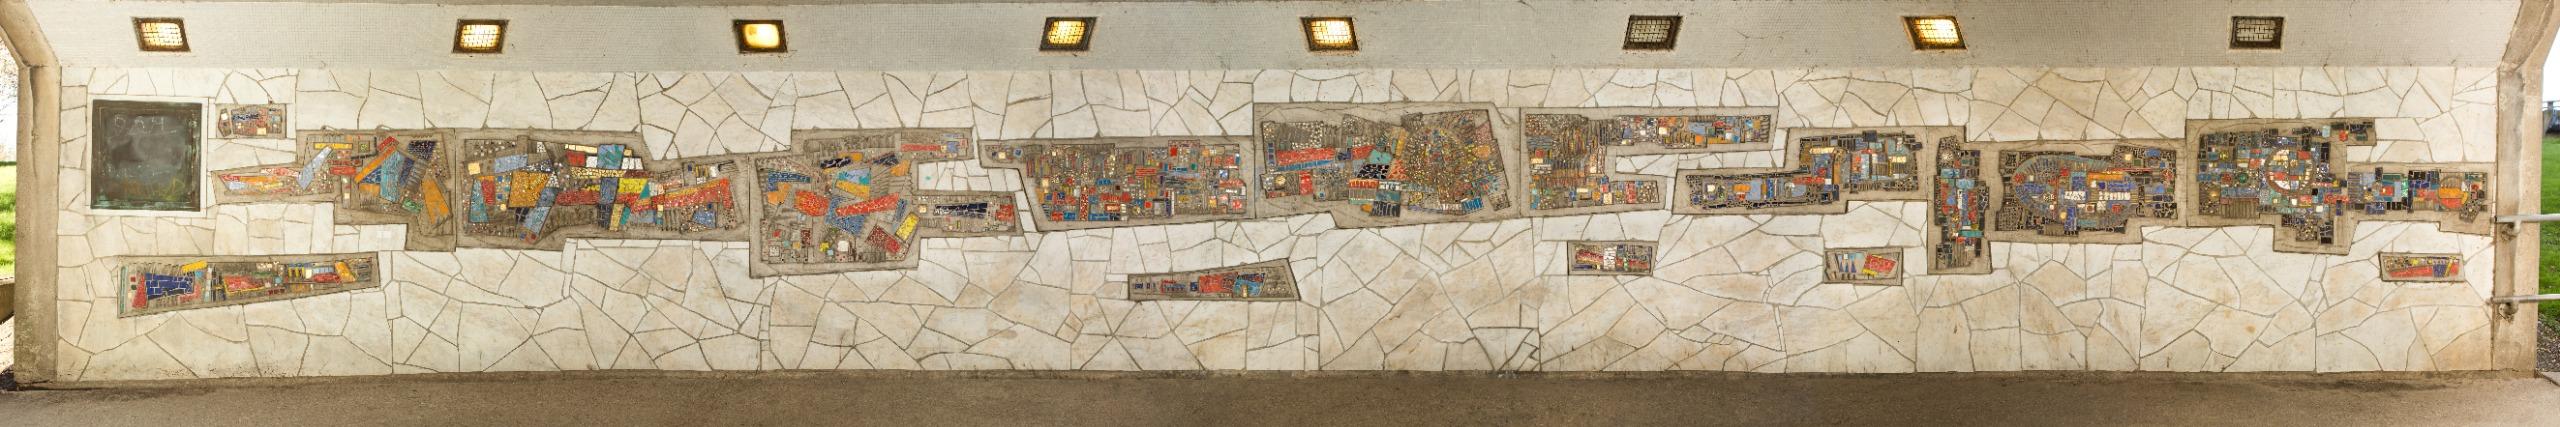 Cantini Mosaic Panorama